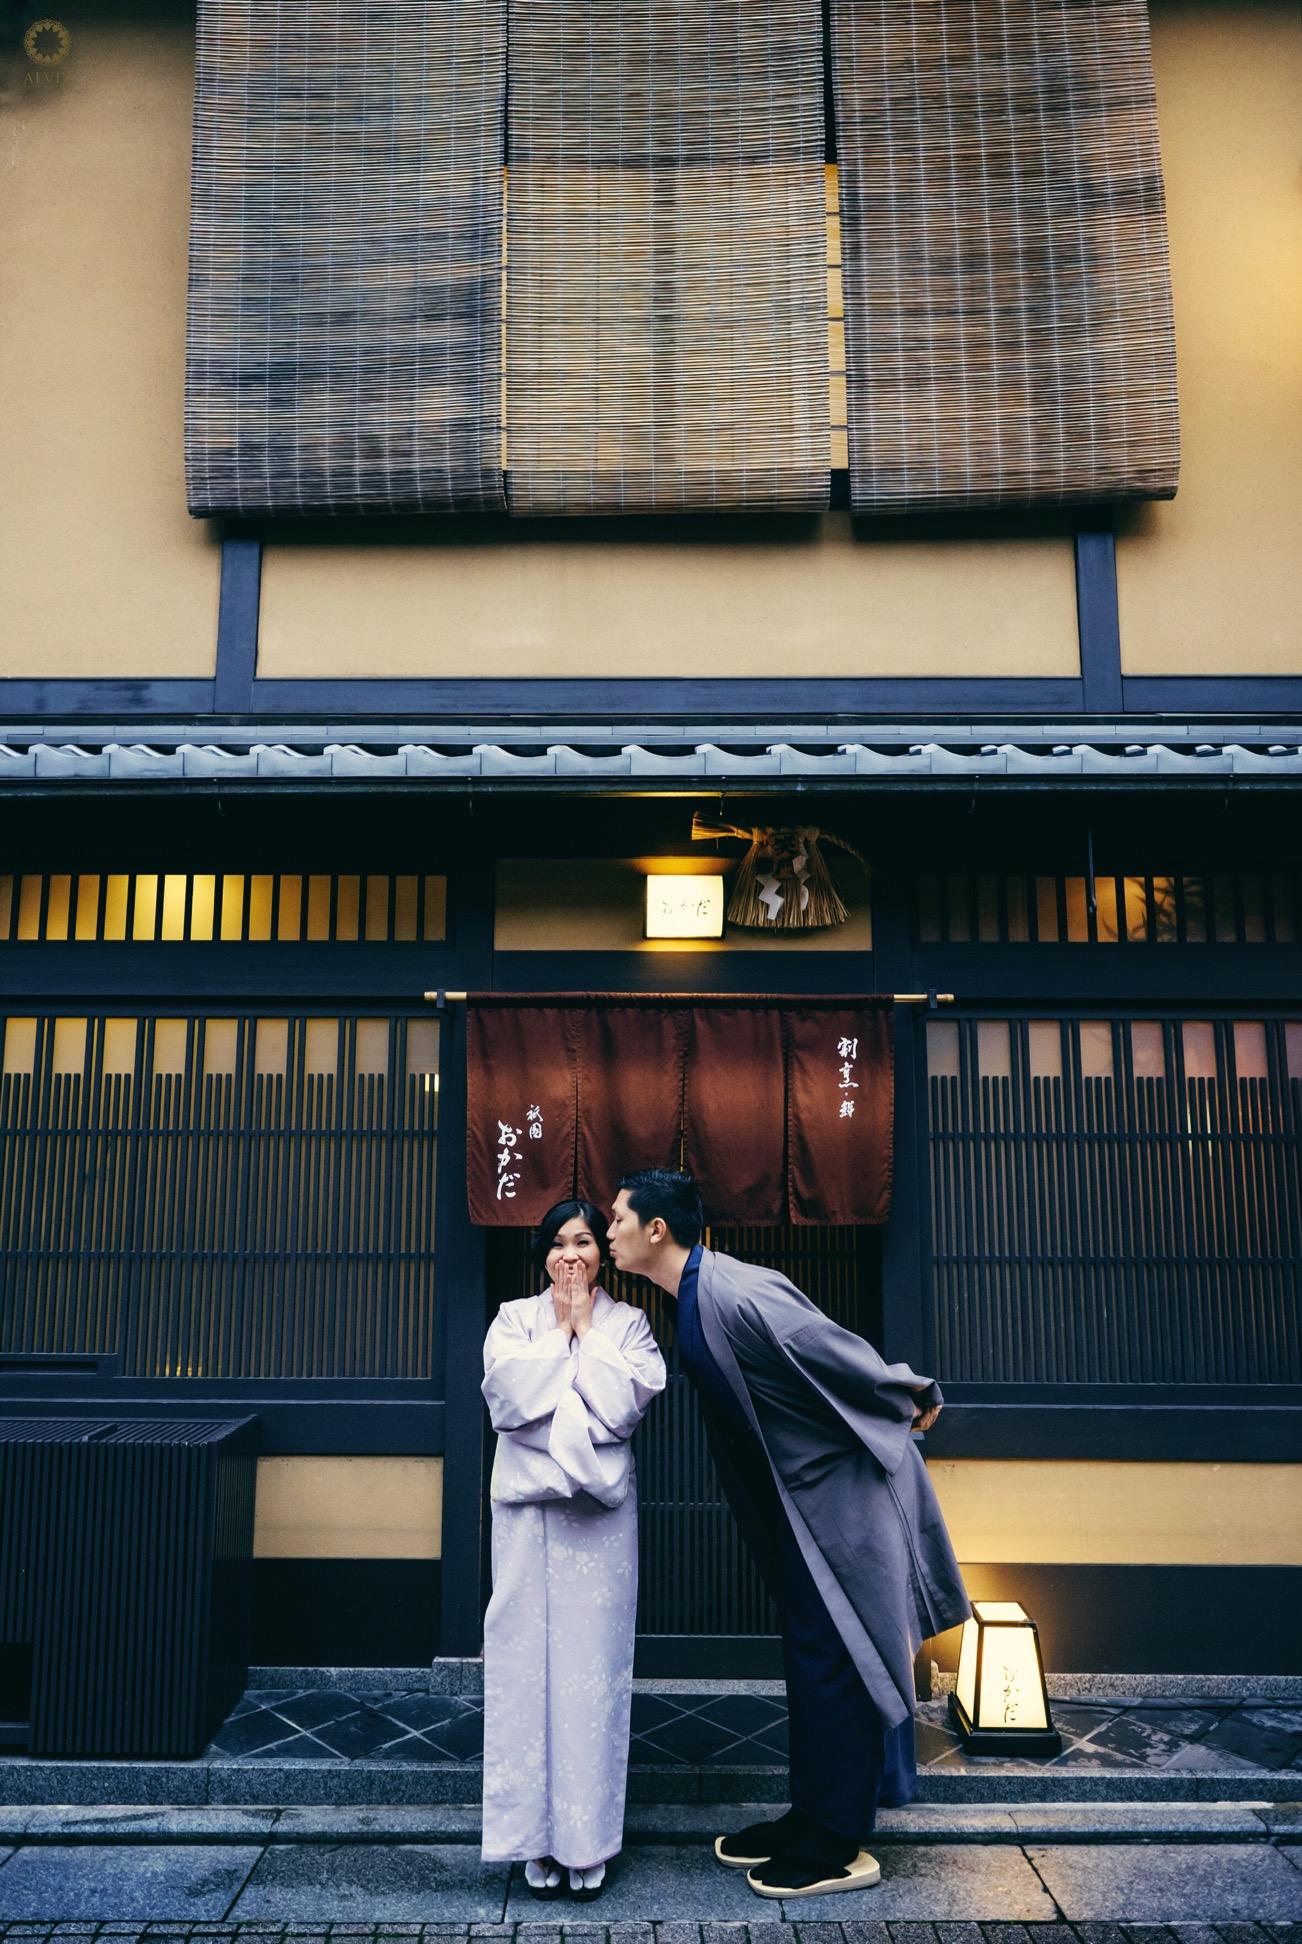 Image : Kezia & Yusin